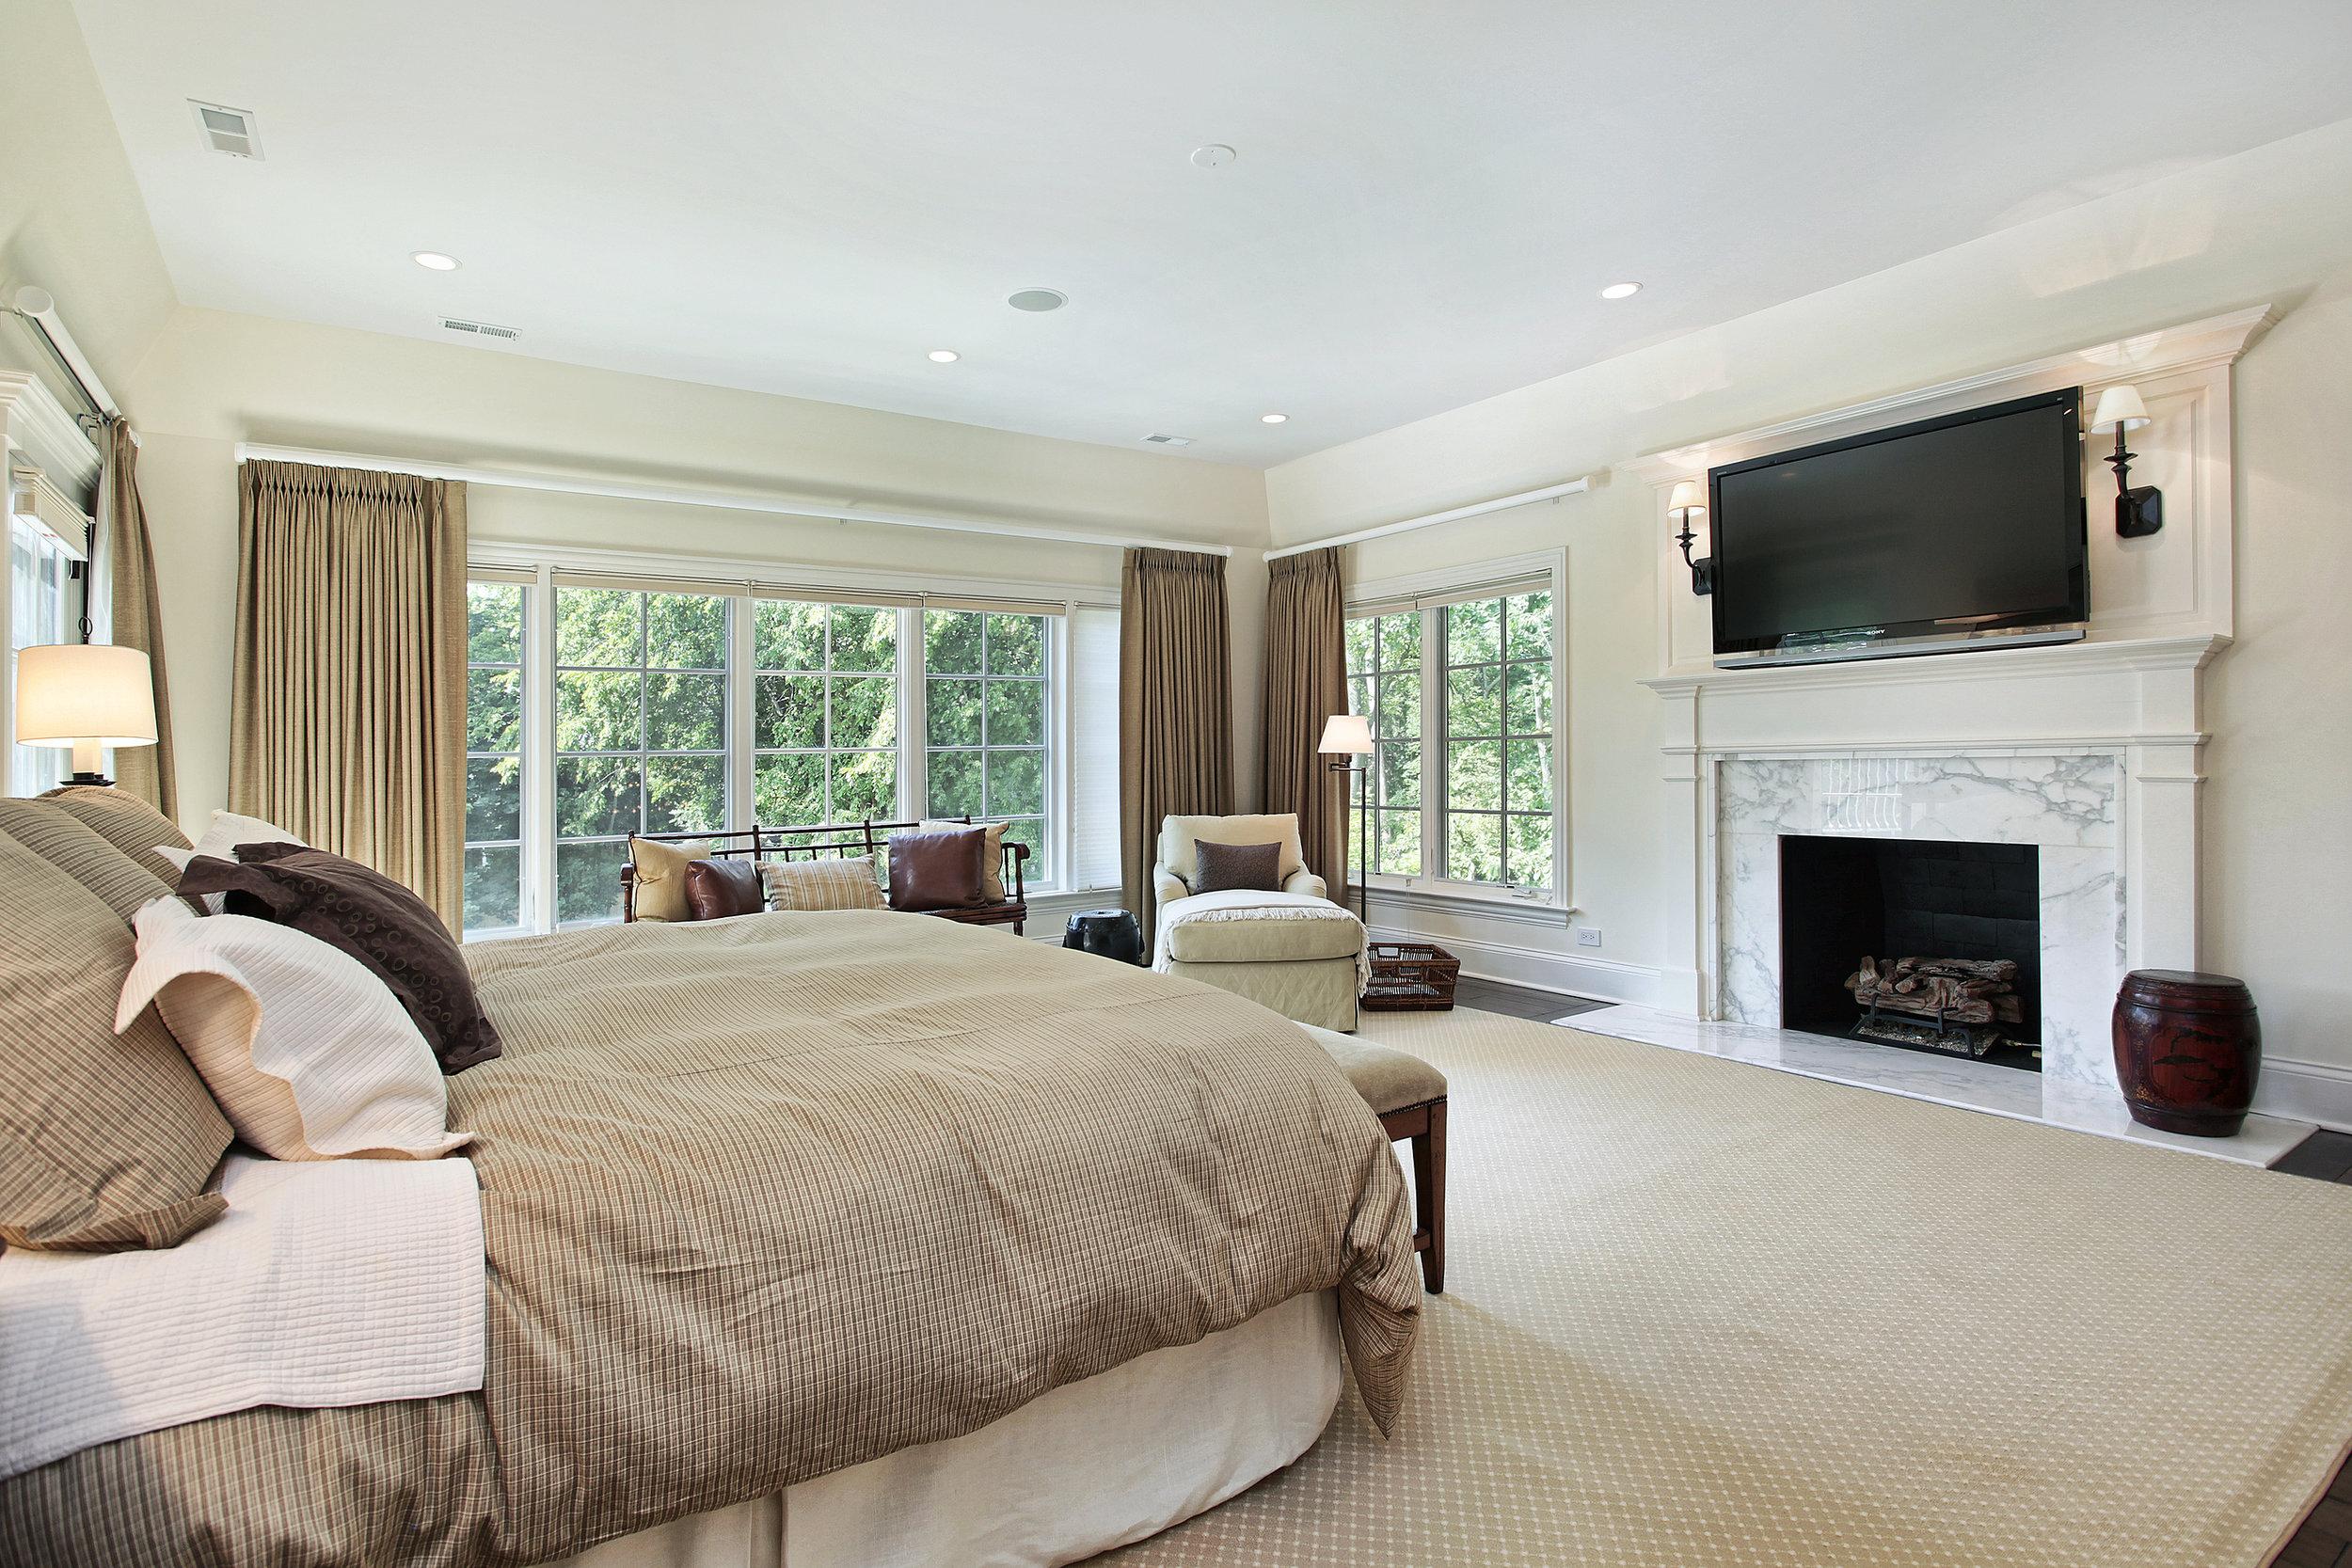 bigstock-Master-Bedroom-With-Marble-Fir-7092161.jpg